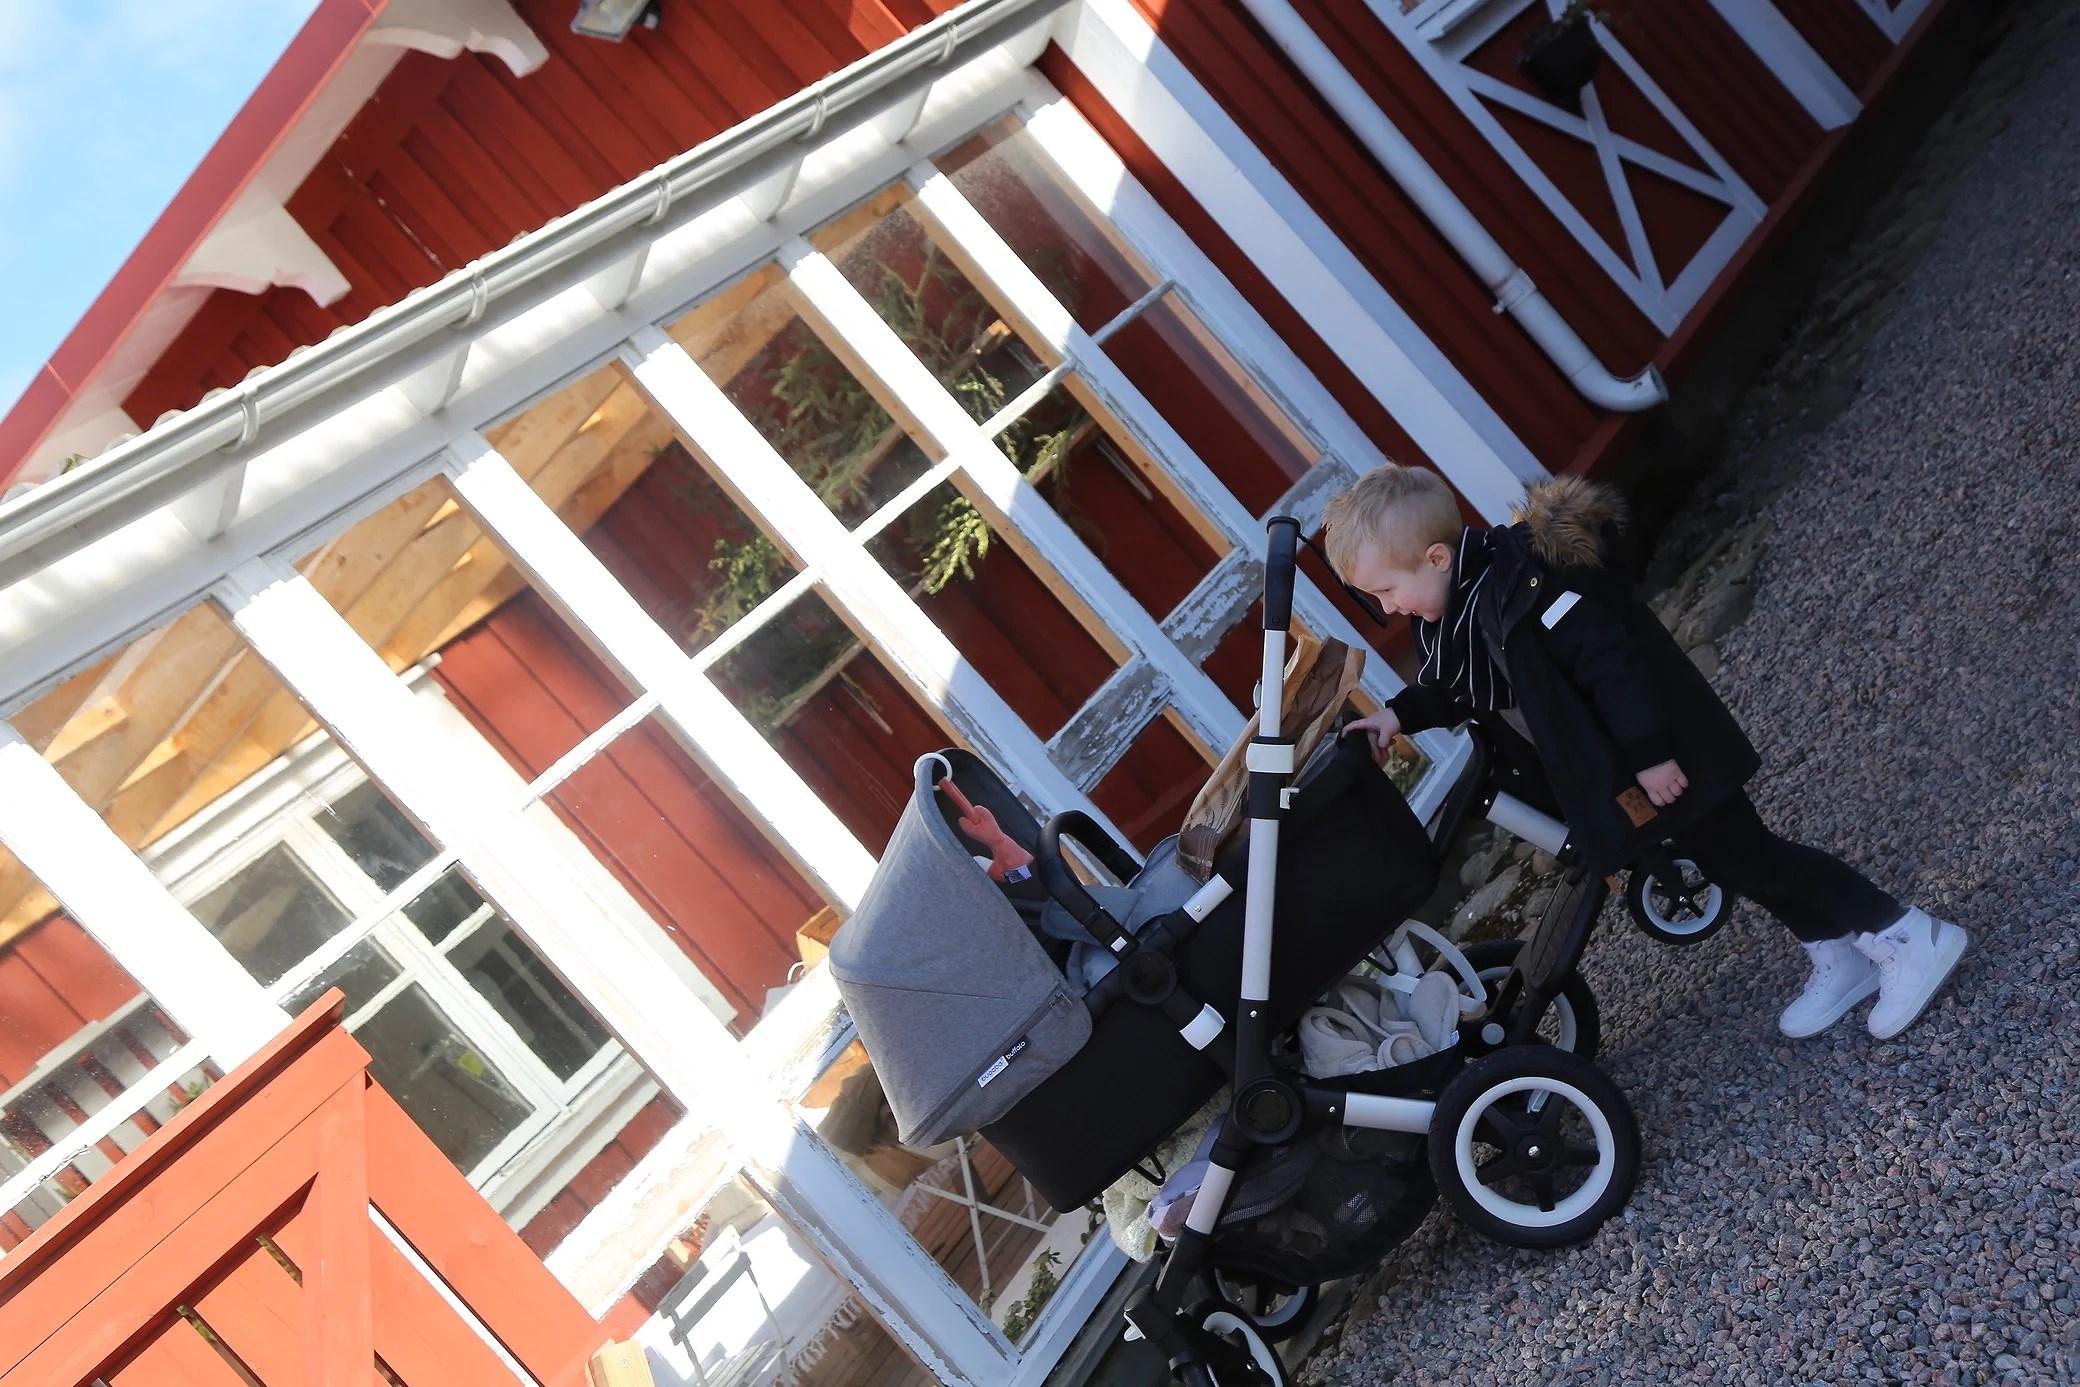 PHOTOSHOOT VID STORA HOLM SÄTERI